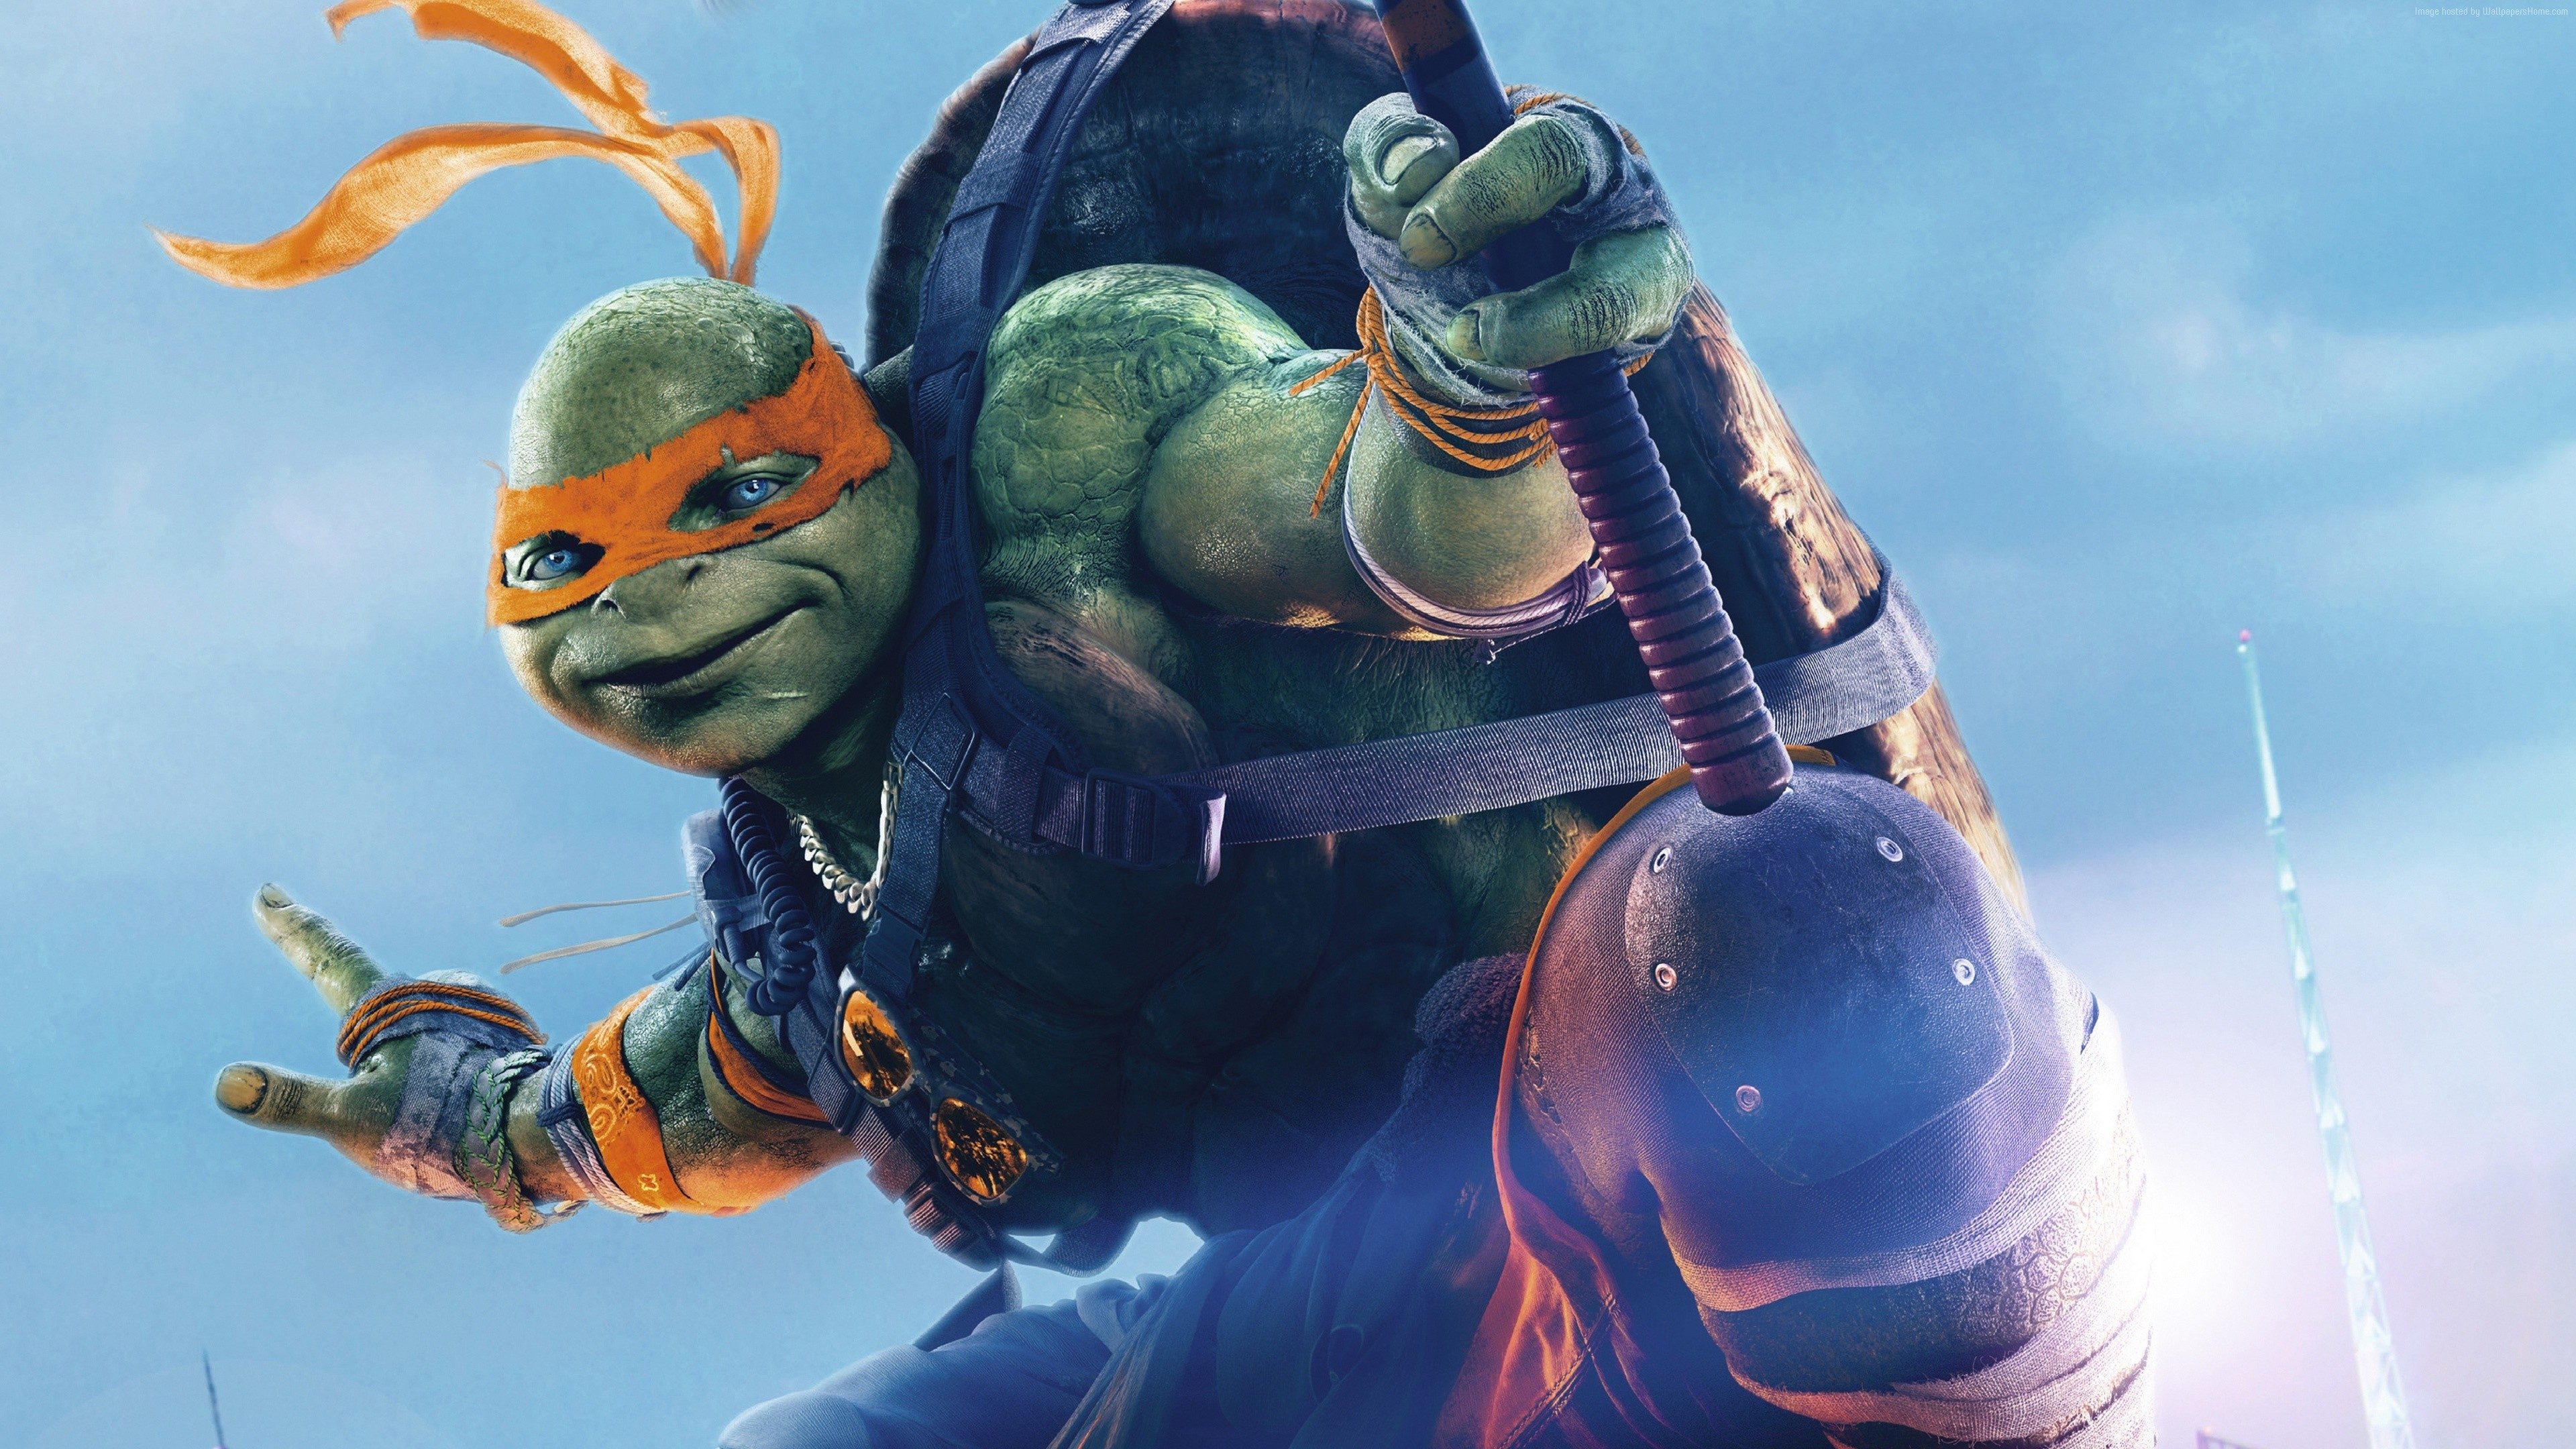 Teenage Mutant Ninja Turtles 2017 Wallpaper Wallpapertag